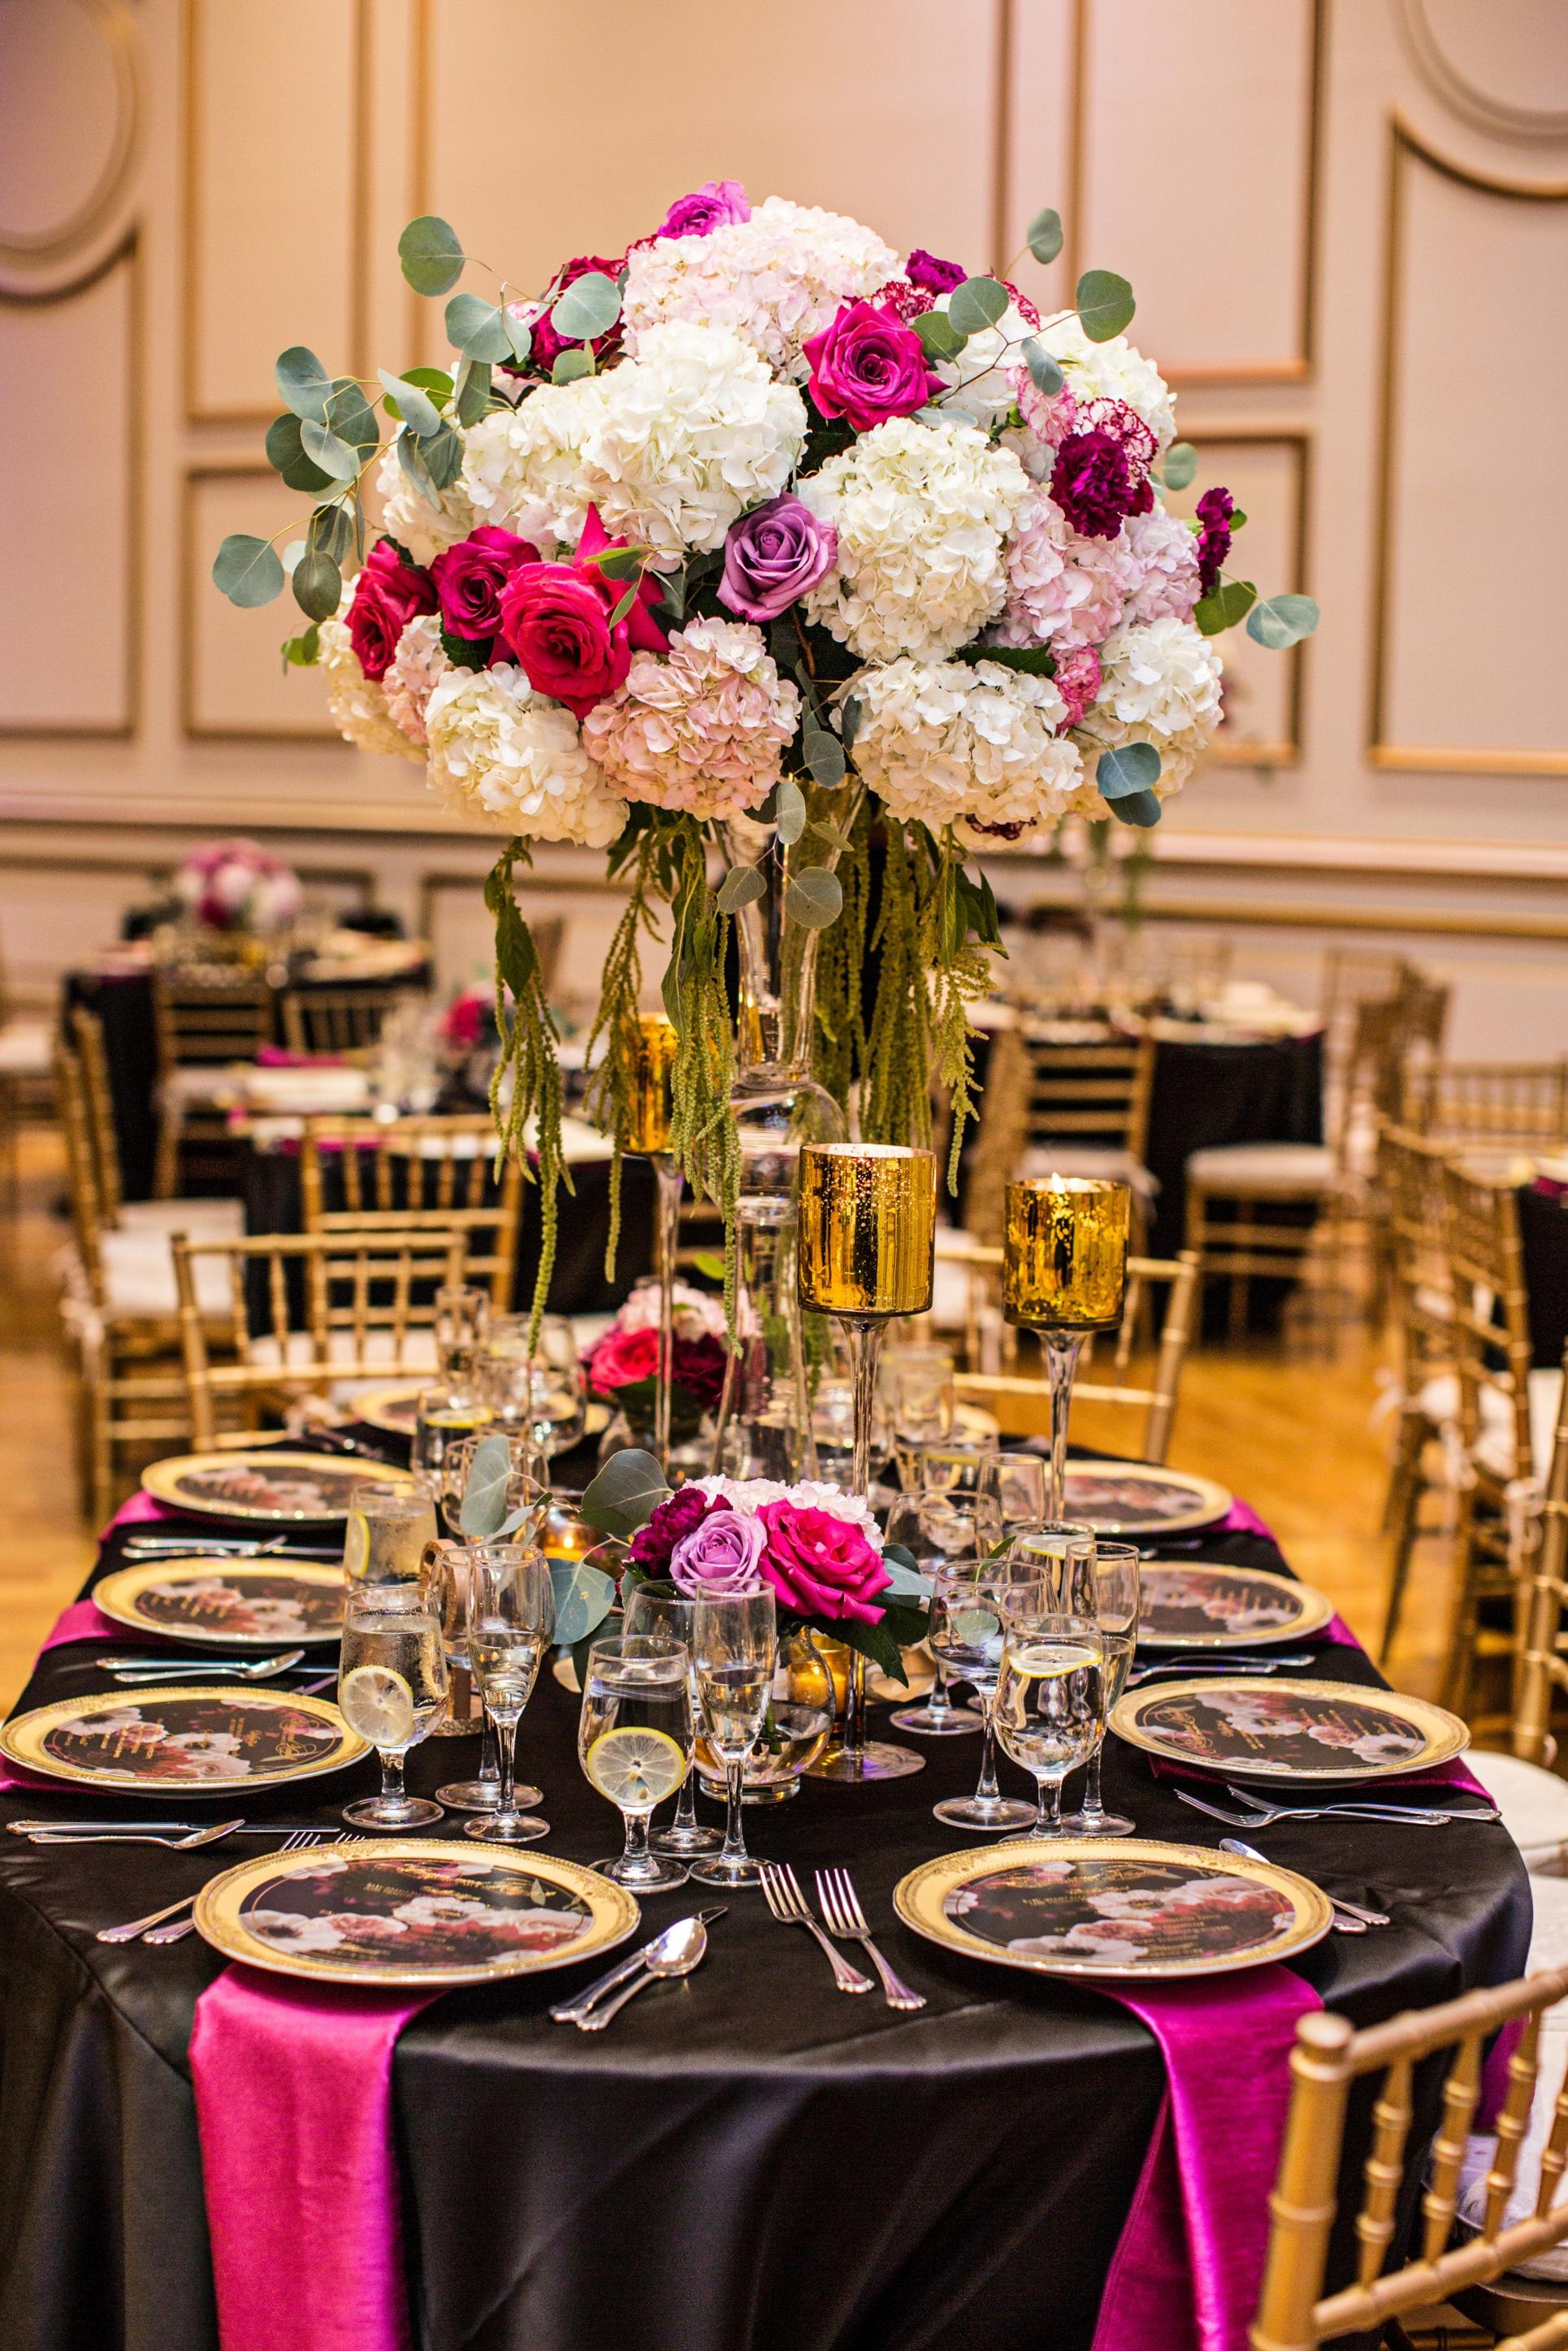 victorious-events-nyc-022-romie-kamali-tides-estate-wedding-nana-annan.jpg